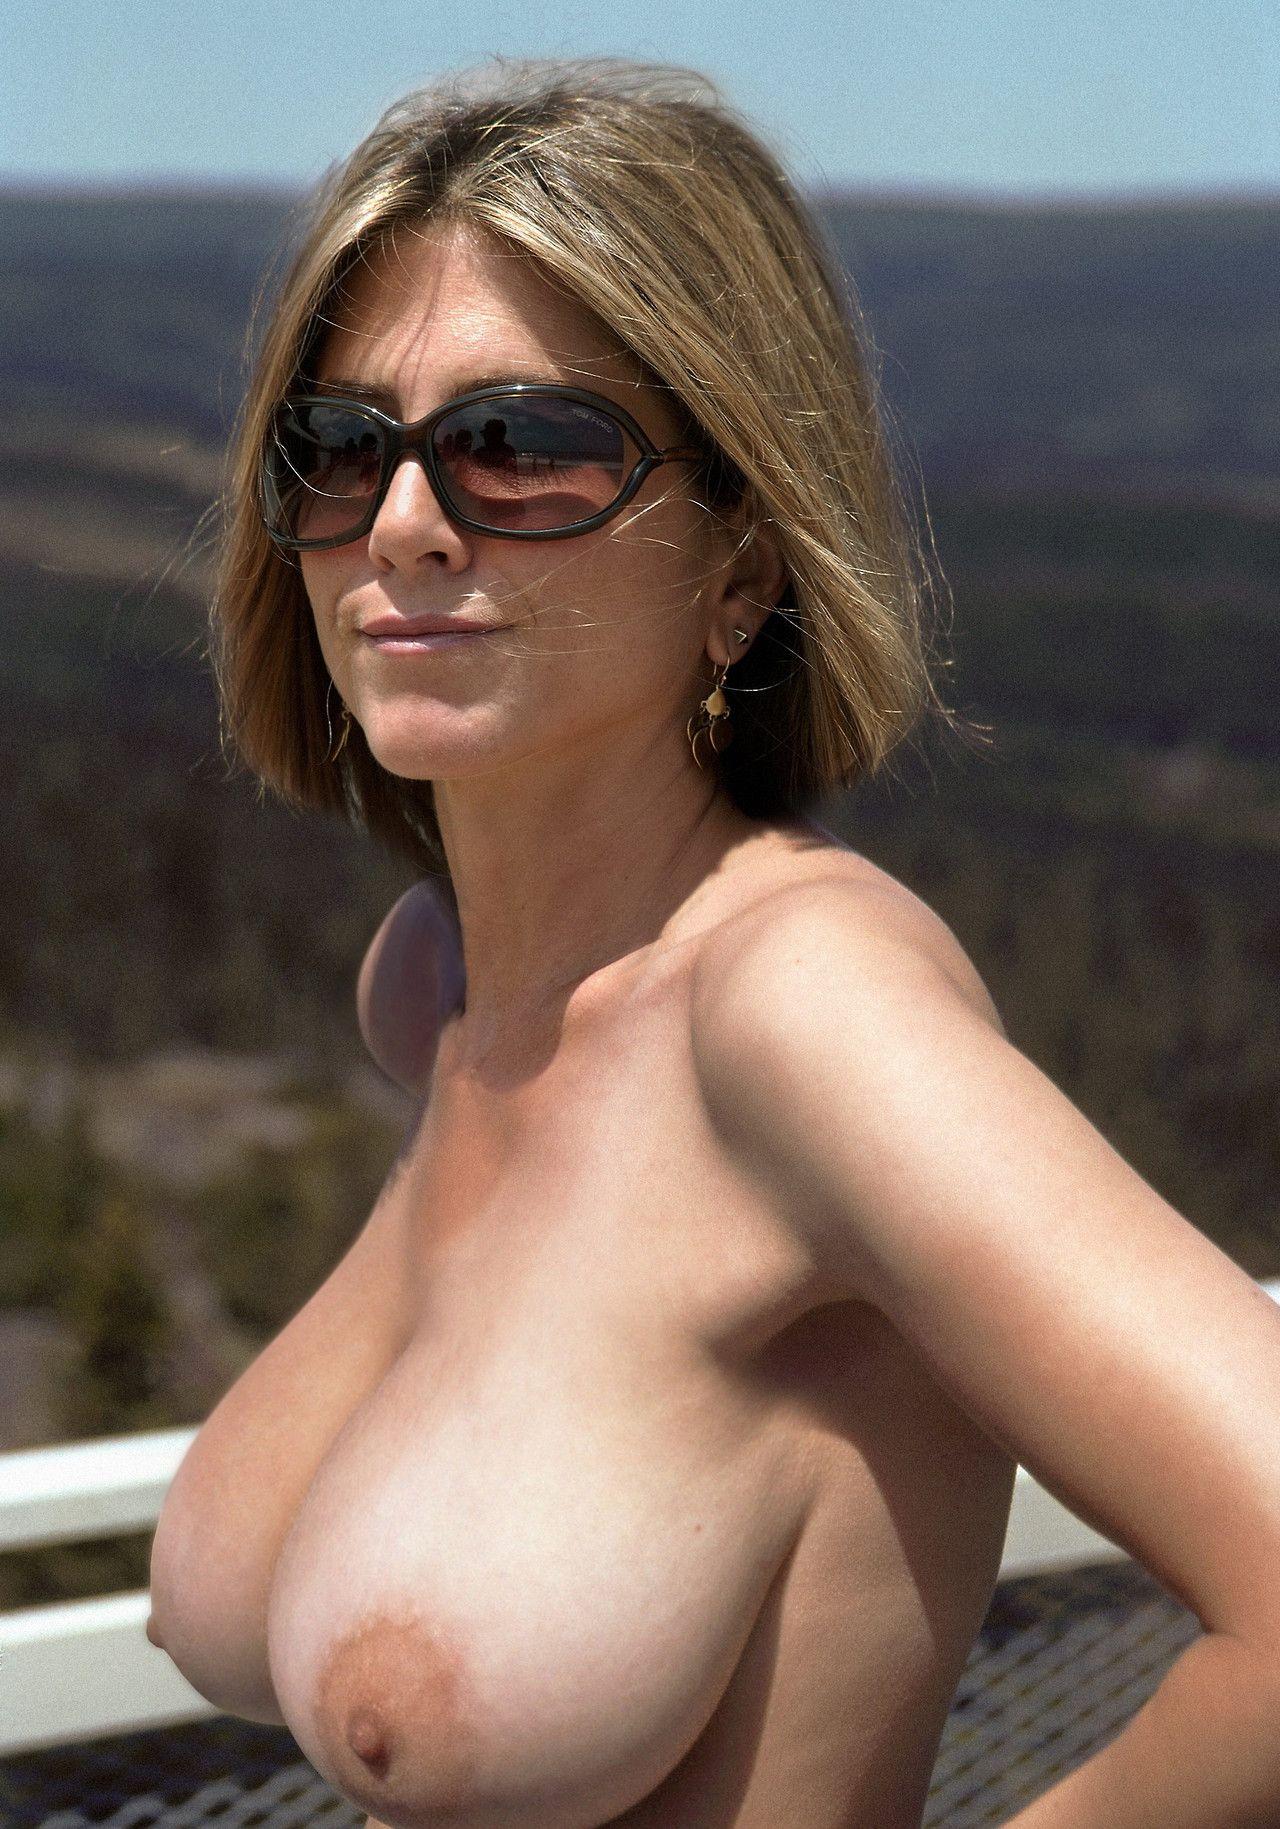 Anna gun nude pics